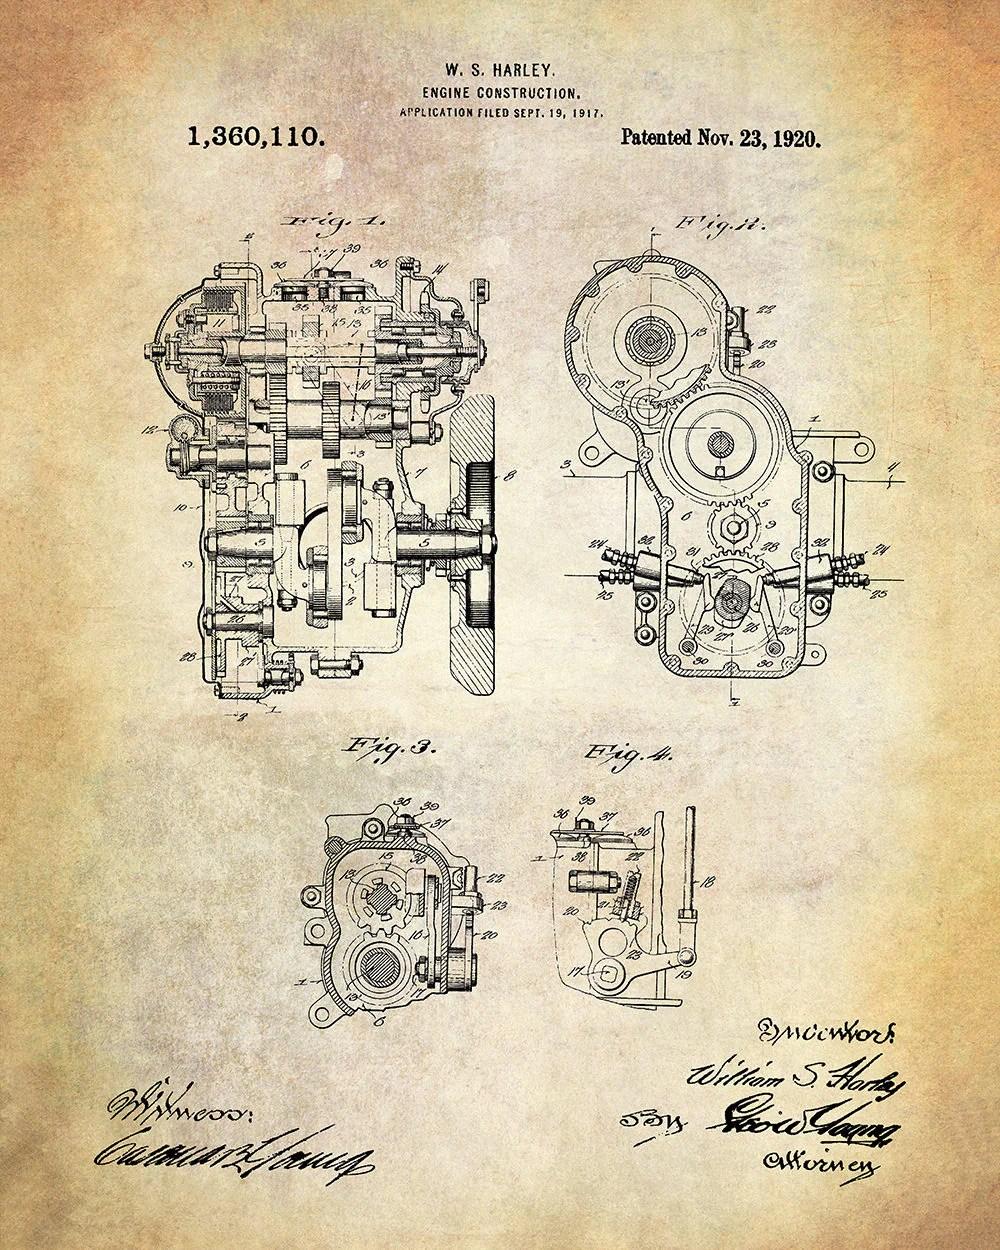 medium resolution of harley engine construction patent art print harley davidson motorcycle engine patent art print harley davidson patent print